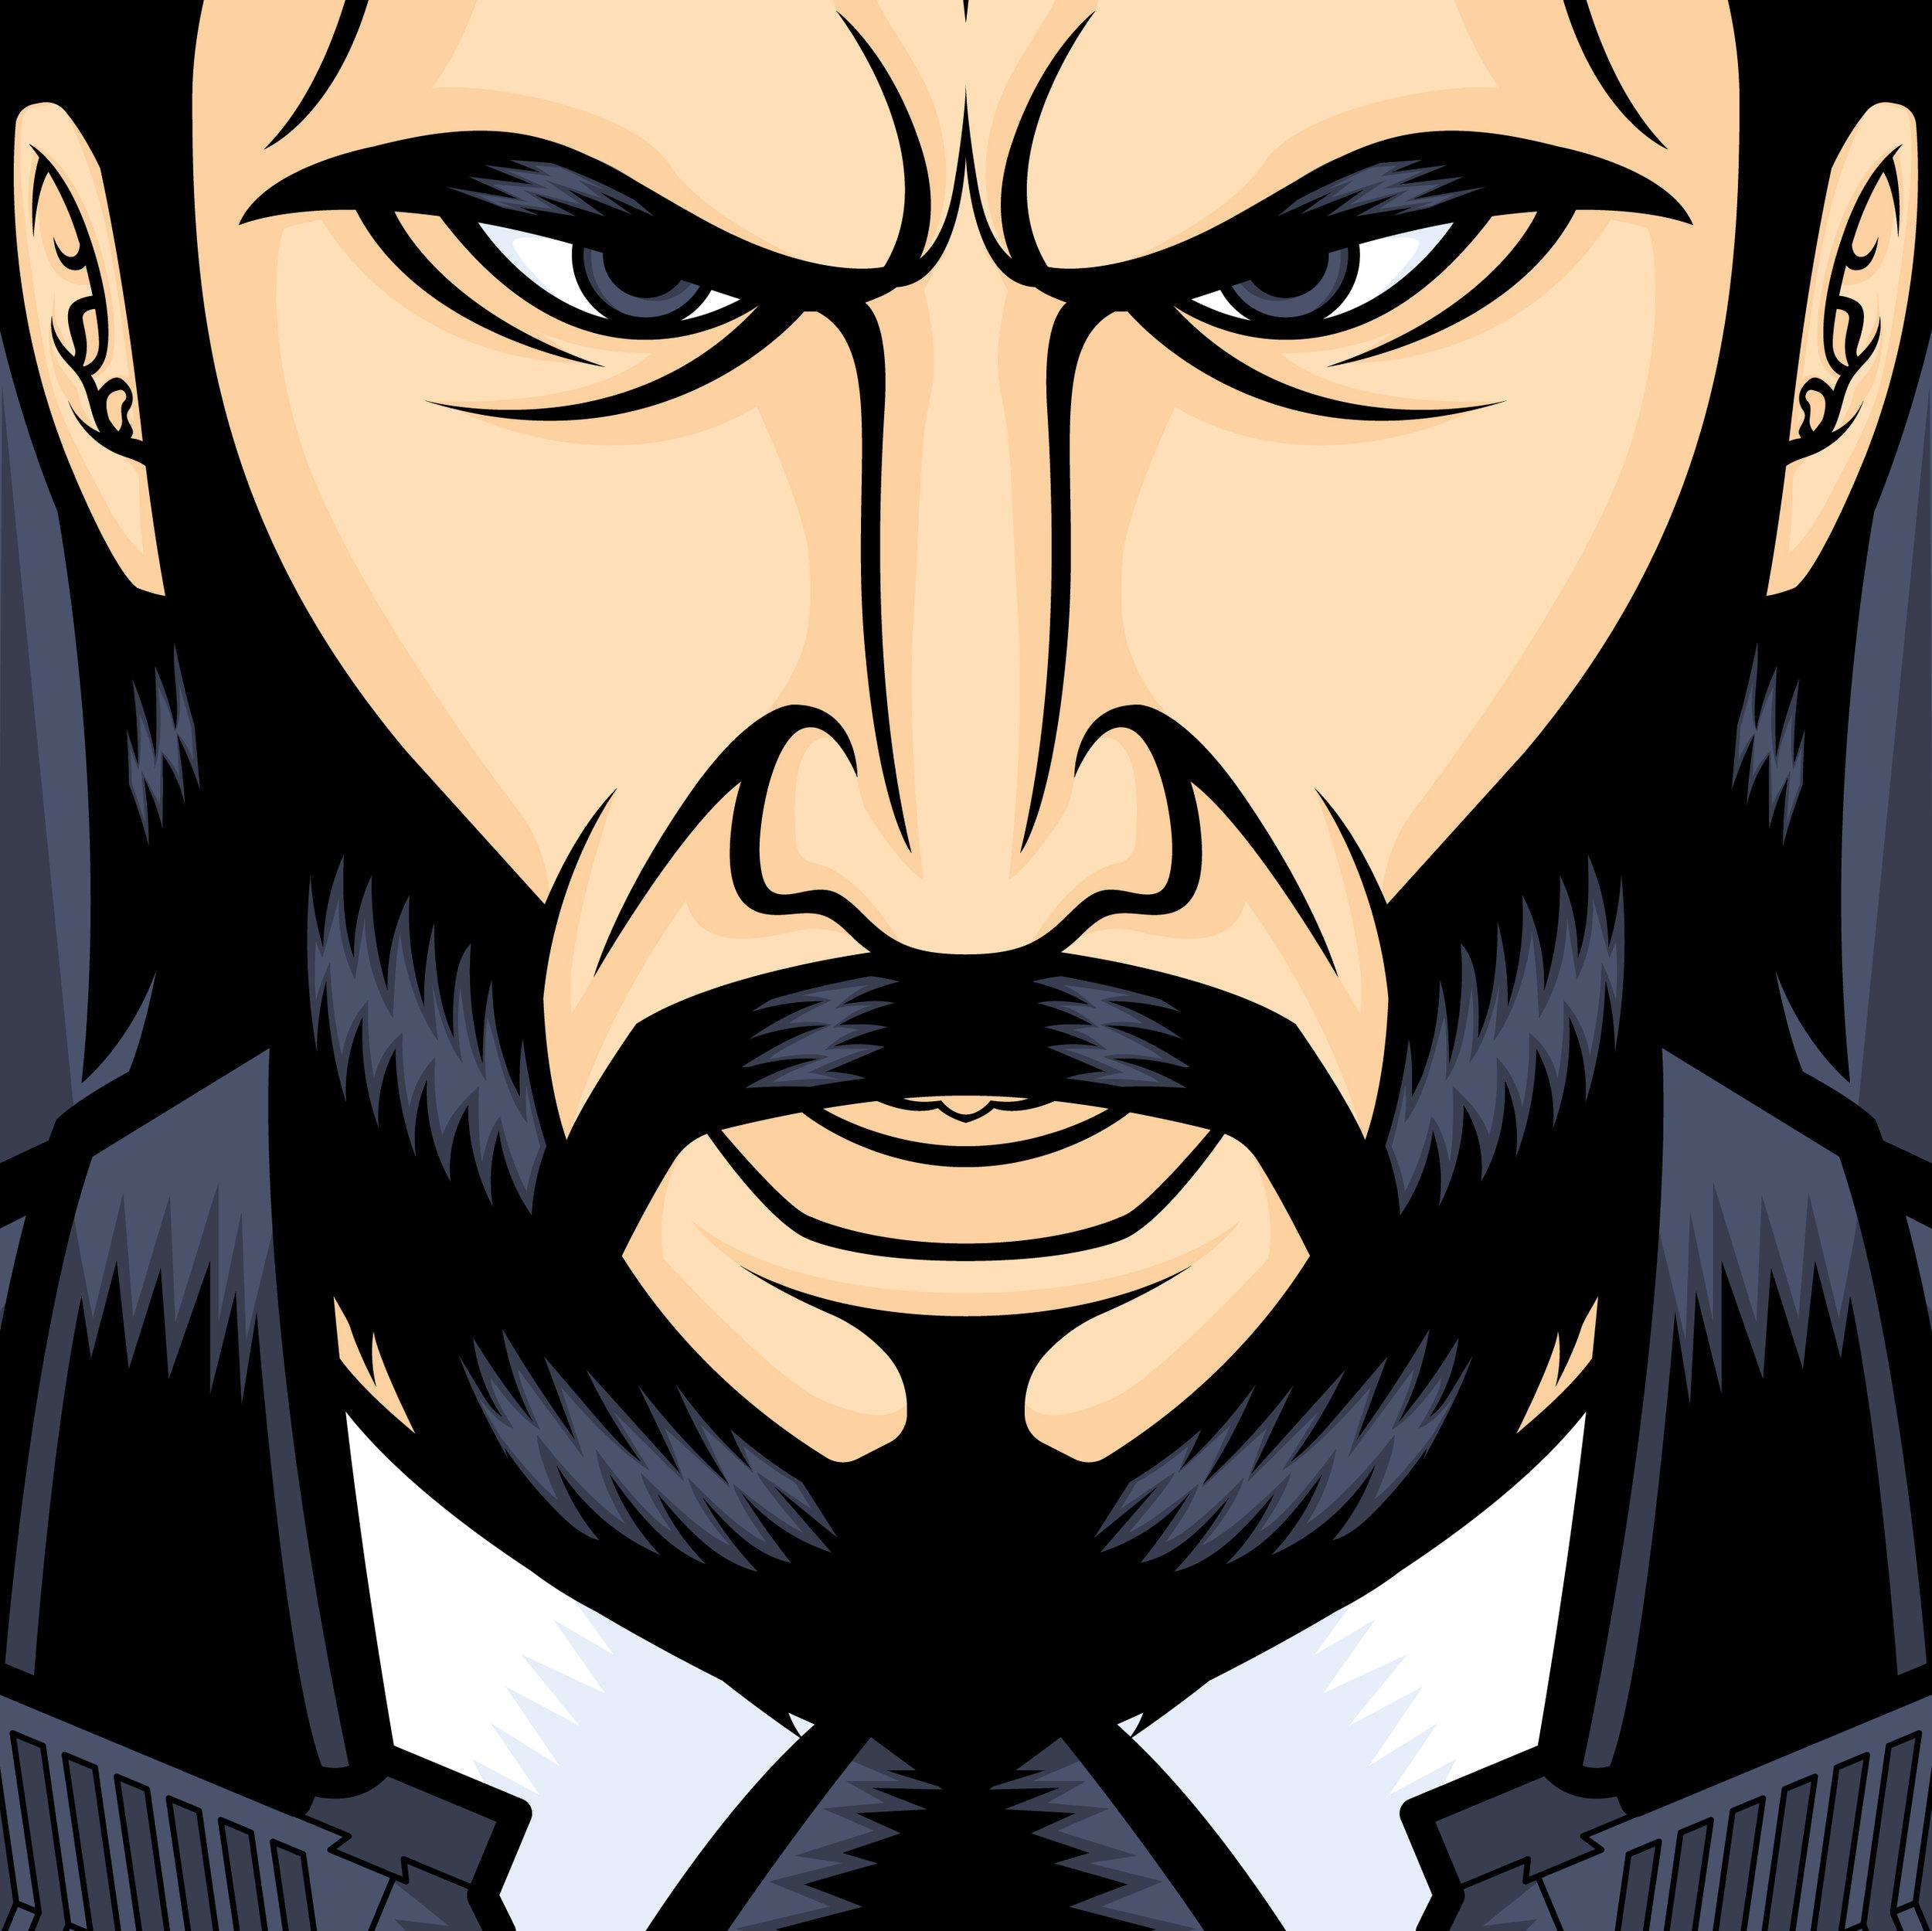 Defcon-Propaganda-john-wick-patch-orozcodesign-robertoorozco-illustration-johnwick-vector-poster-design-keanu-reeves.jpg.jpg